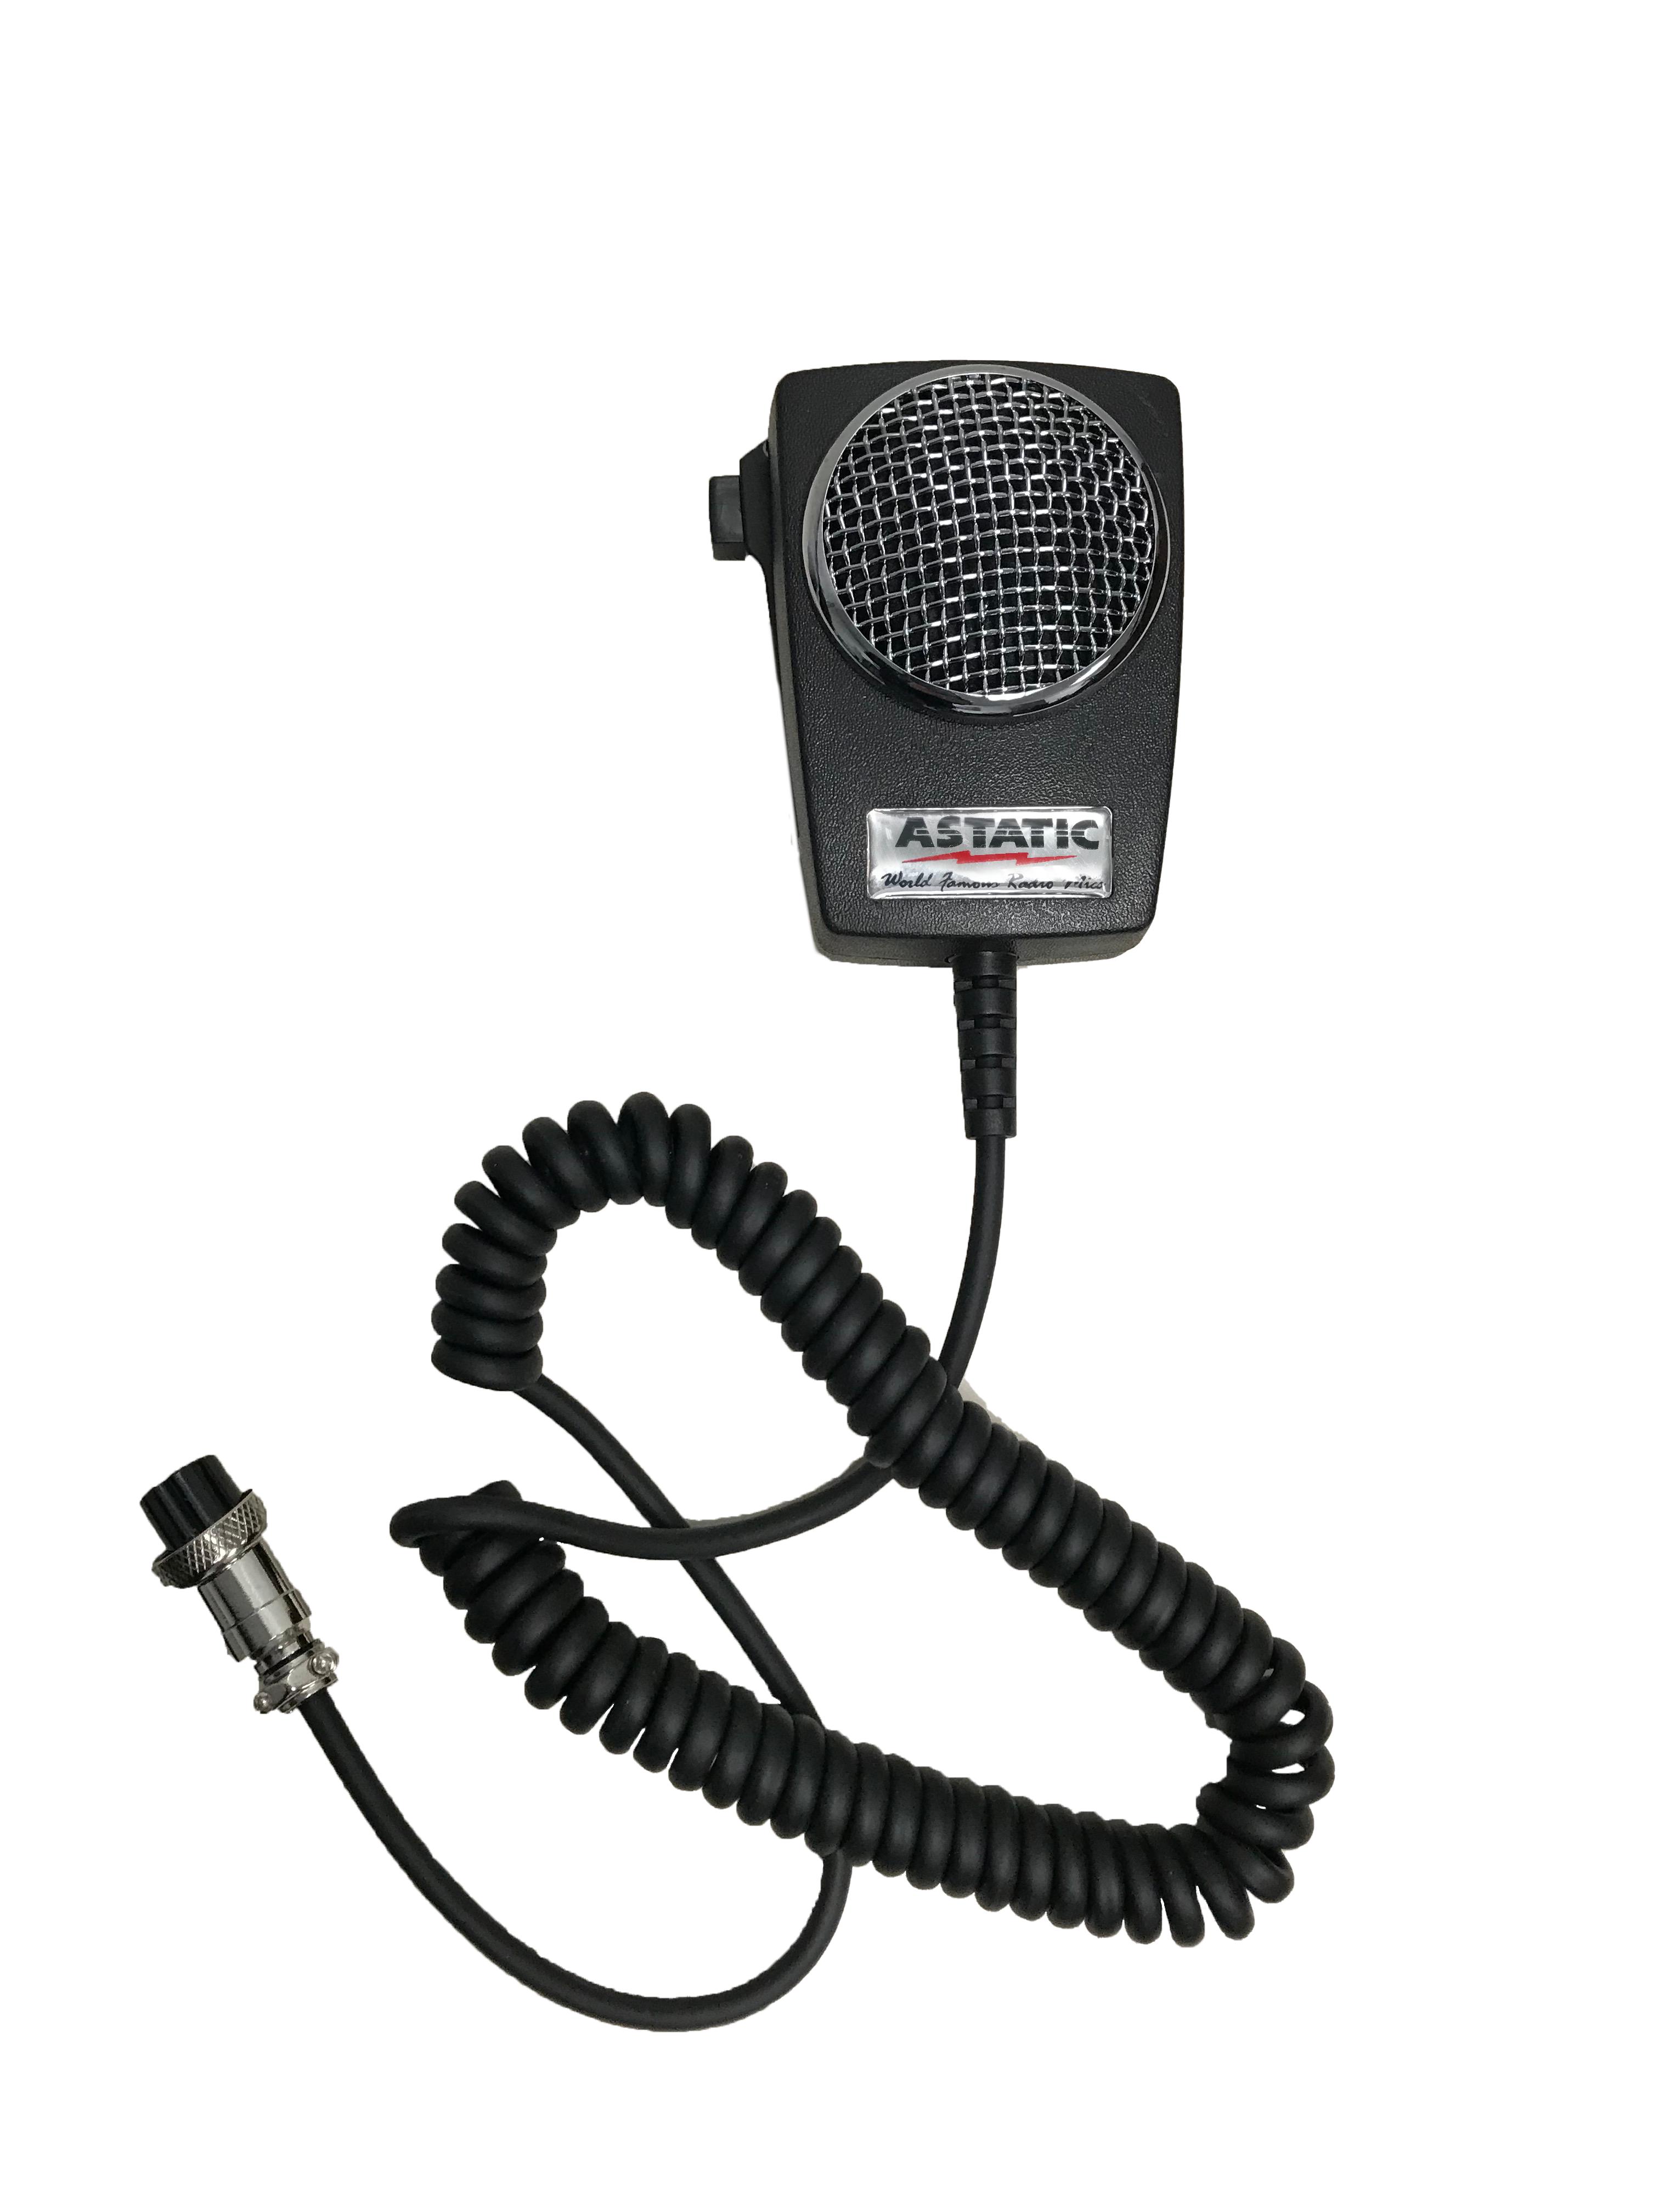 D104M6B-DX1 - Astatic 4 Pin Power CB Microphone